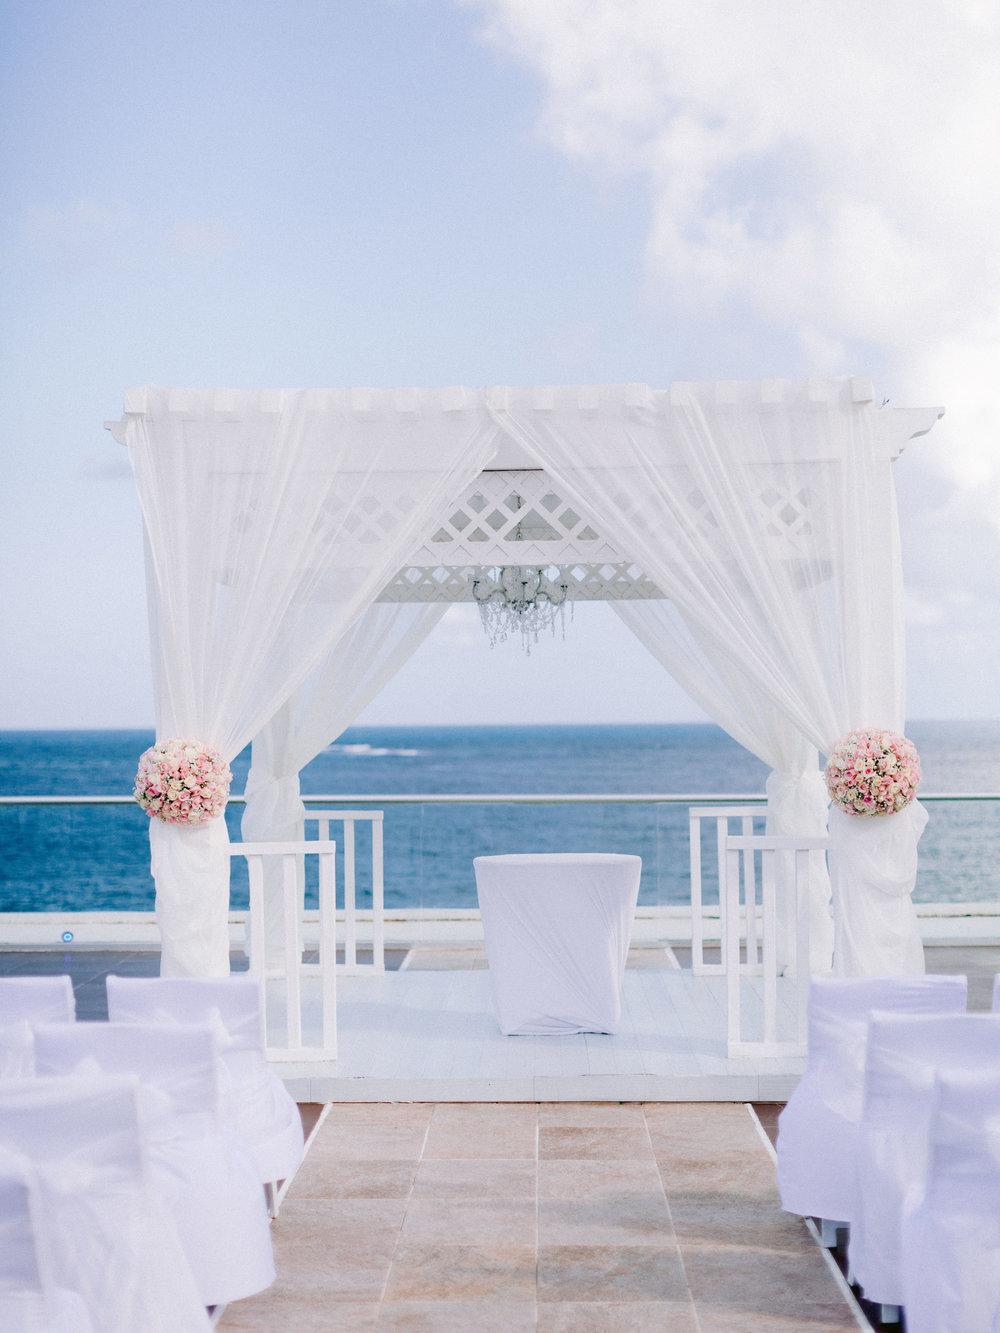 Kim_Jeff_Cancun Wedding_Ceremony_Kurtz_Orpia (6 of 119).jpg